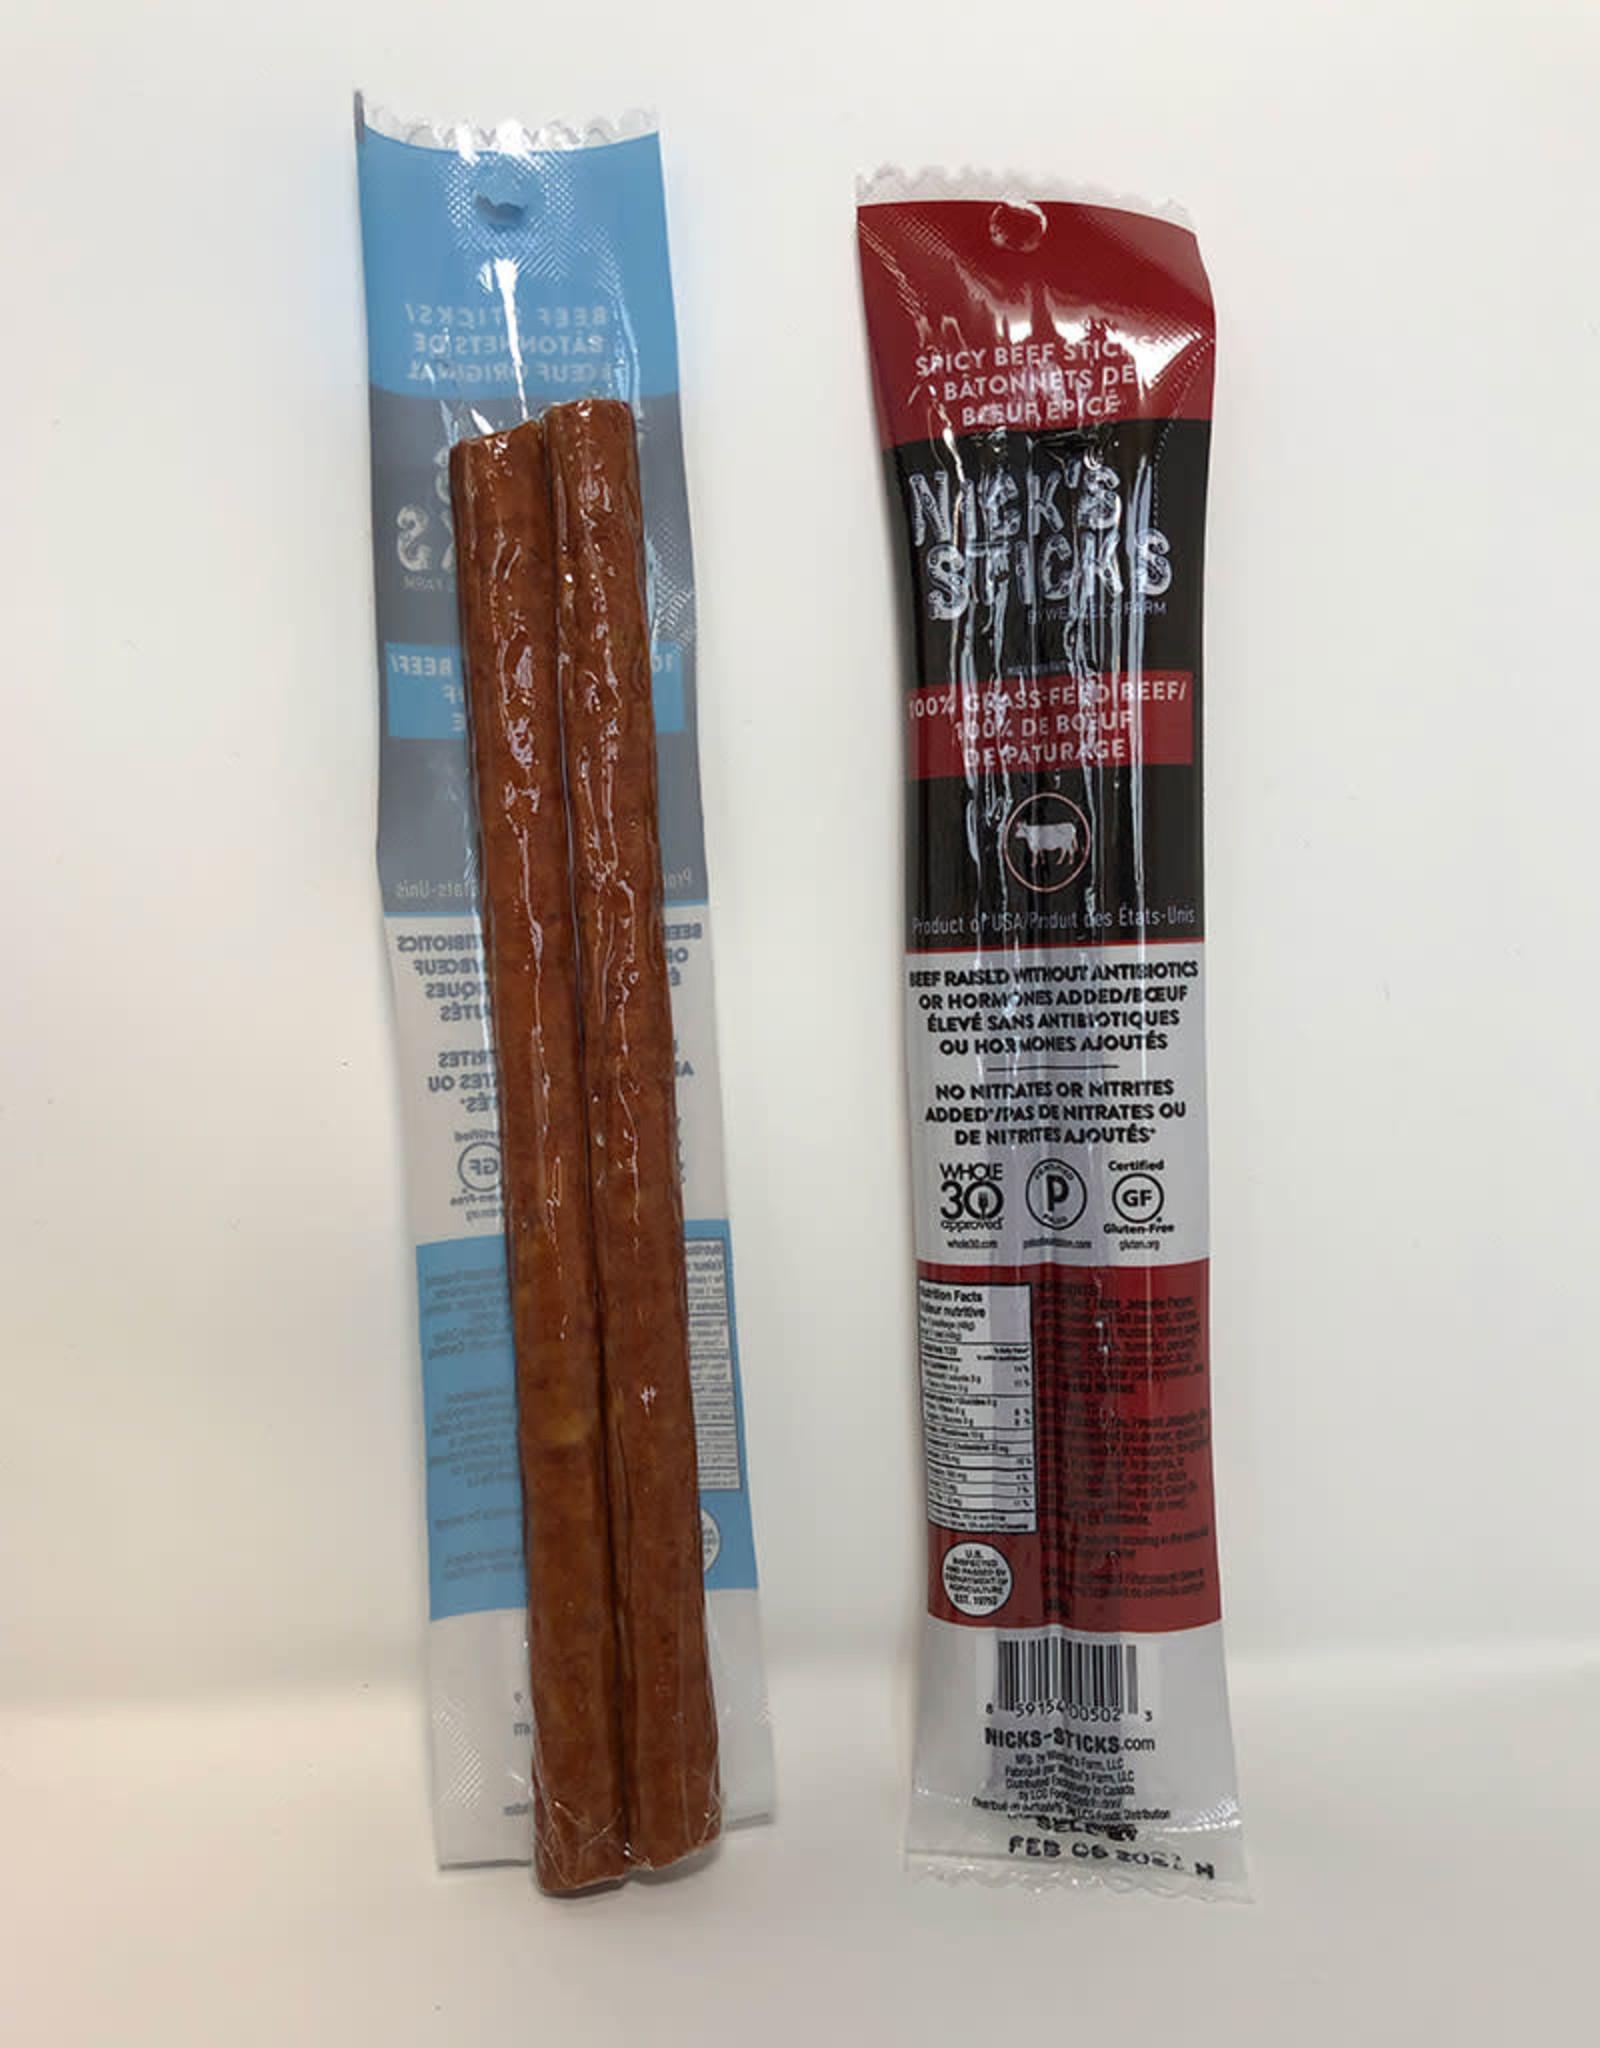 Wenzels Farm Nicks Sticks - Grass Fed Beef Snack Sticks, Spicy